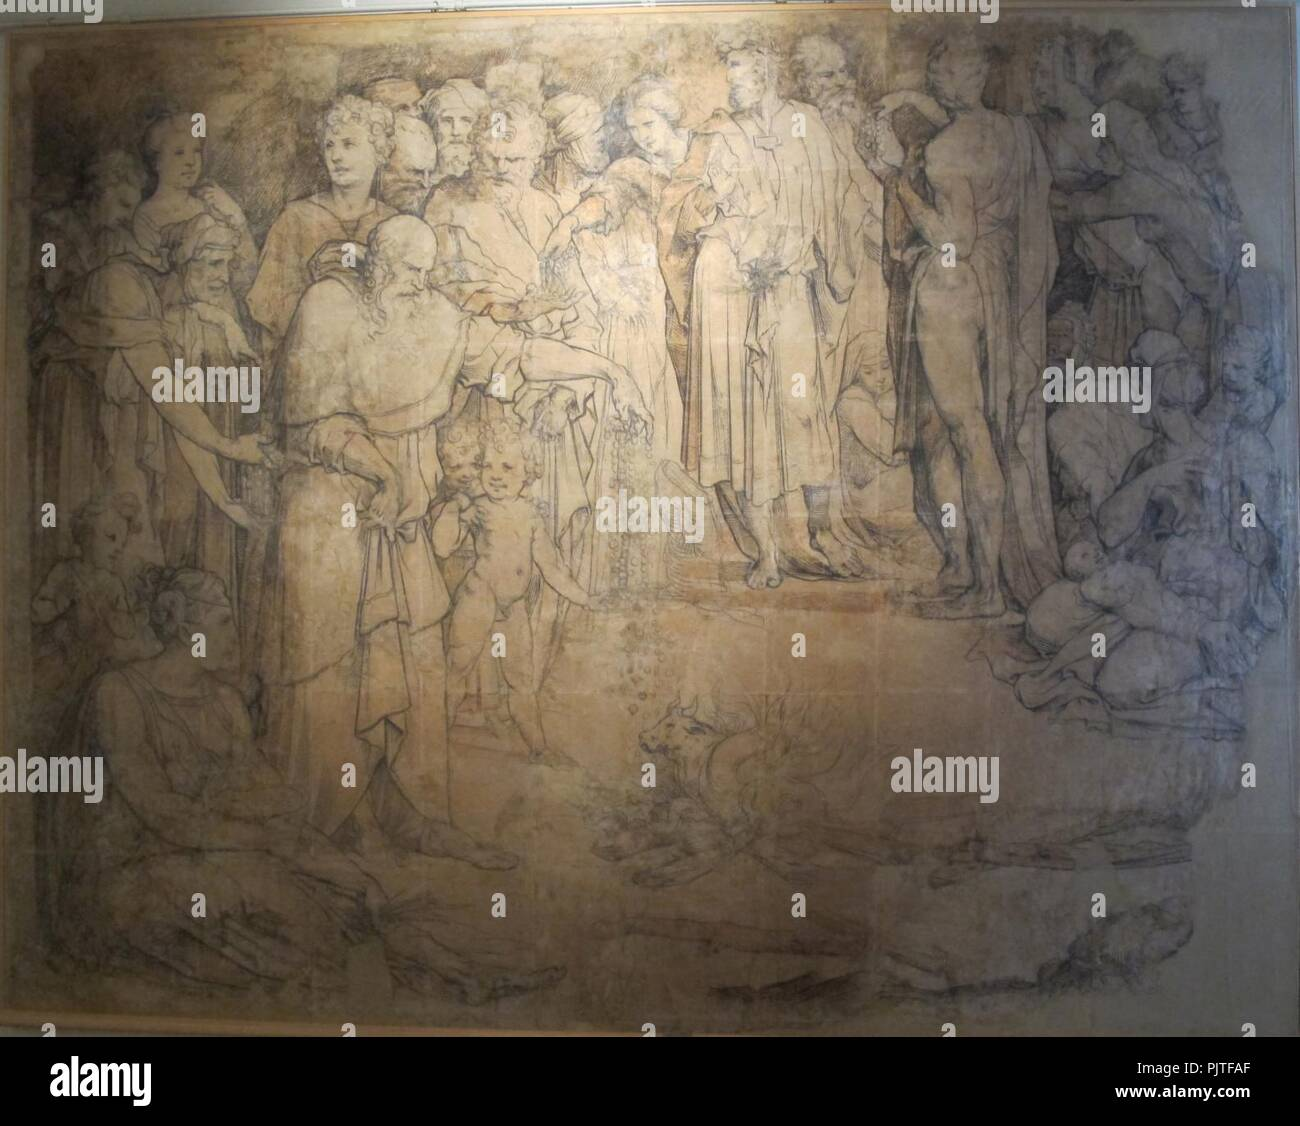 Beccafumi, cartone por pavimento duomo diena, 1529-1531, 03. Imagen De Stock